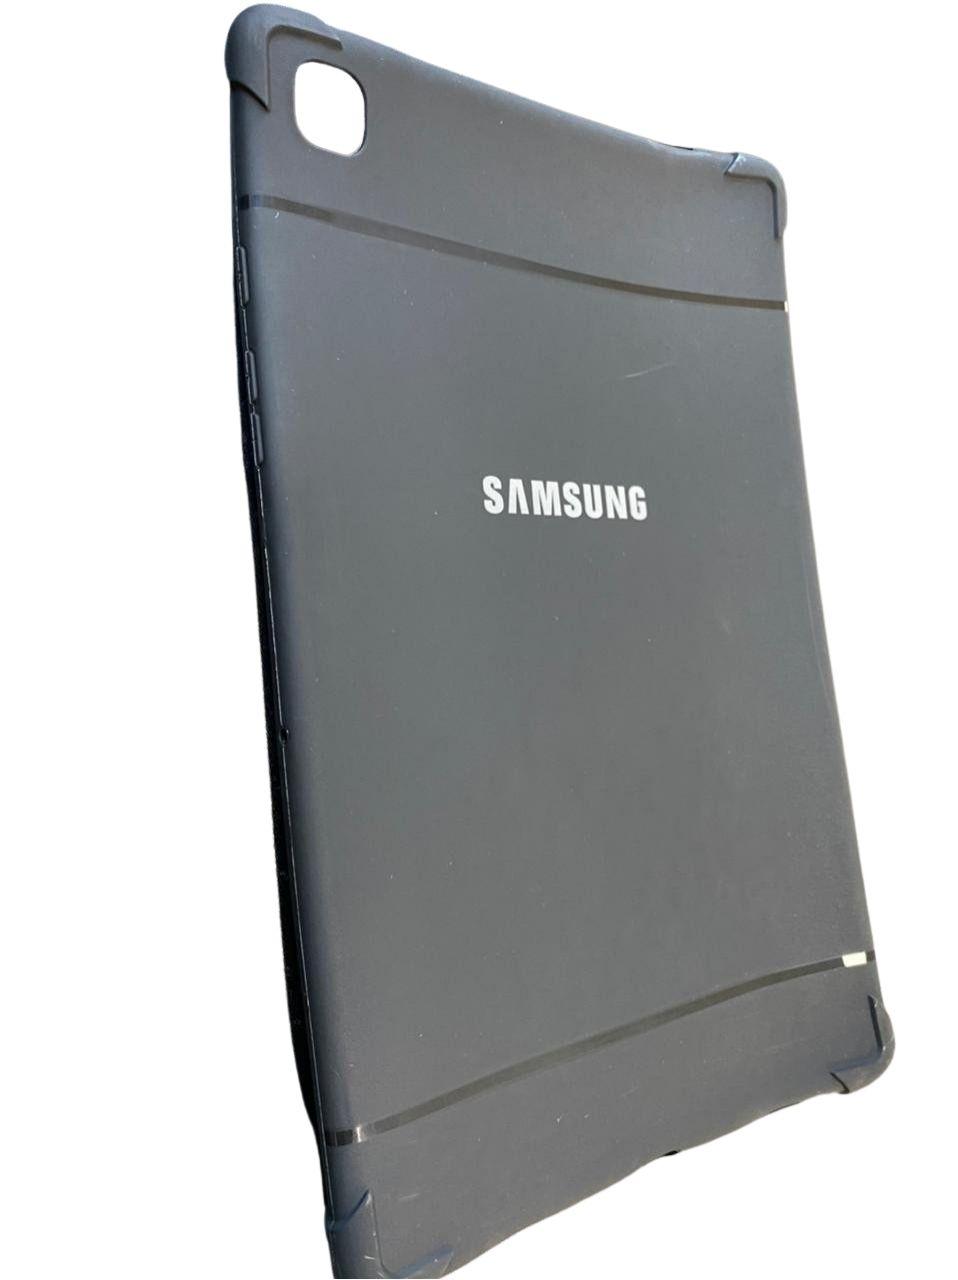 Capa Tablet Samsung Galaxy Tab A7 10.4 T500 T505 Tpu Silicone Preta